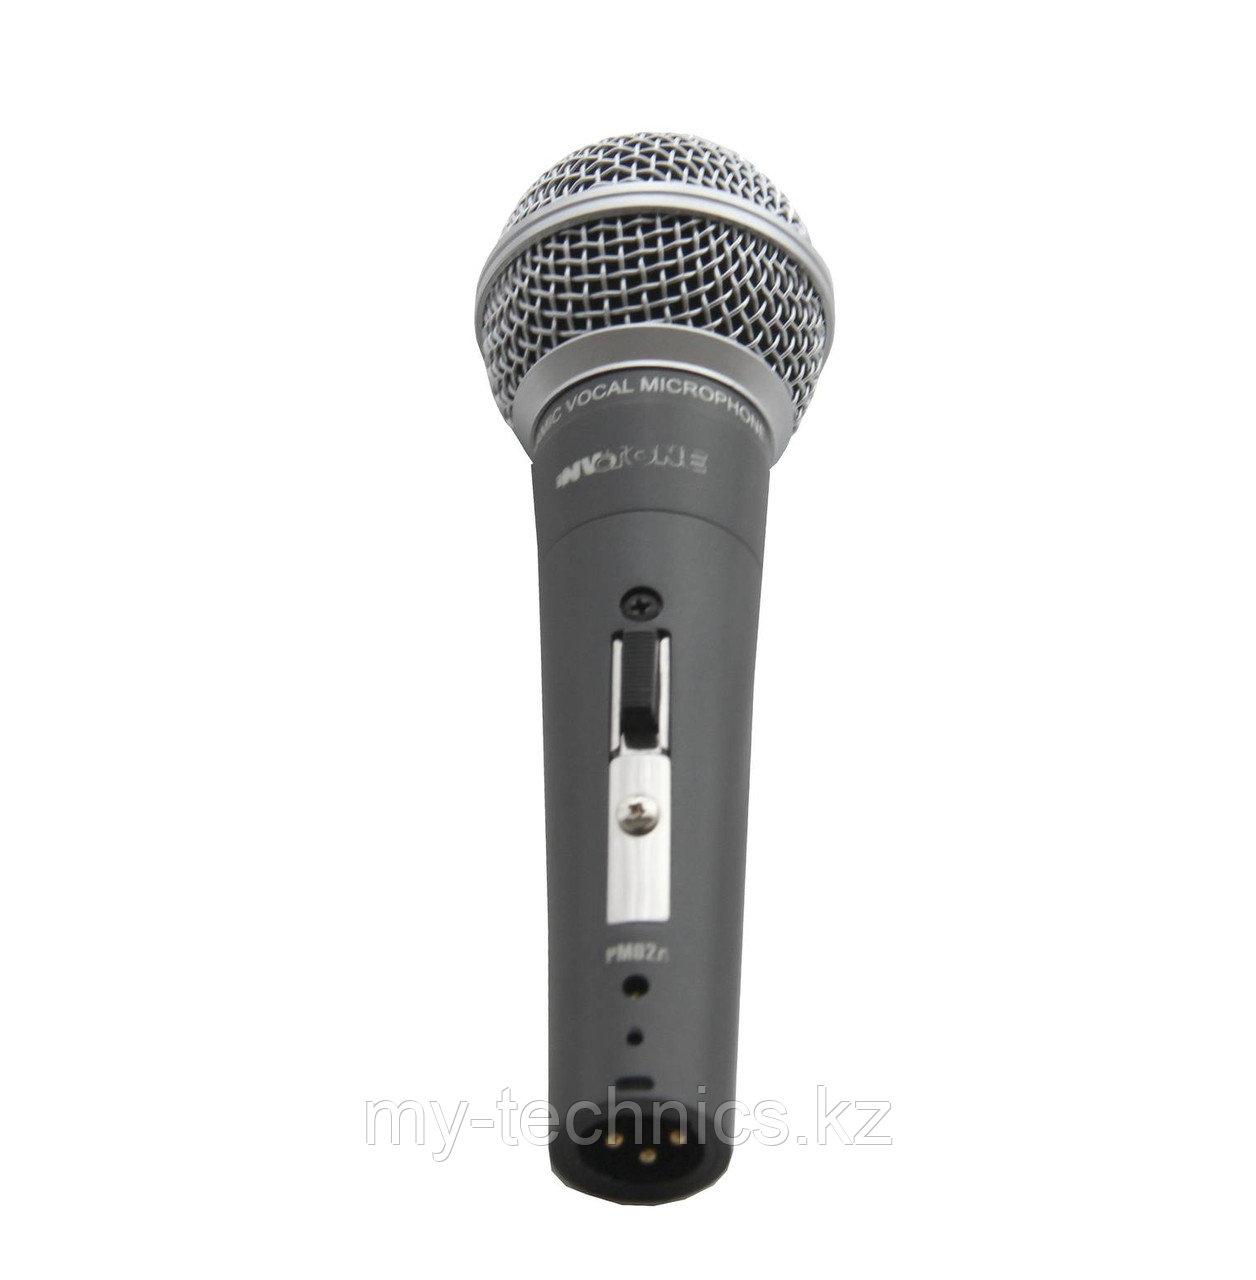 Микрофон NewStar 88-OK-200